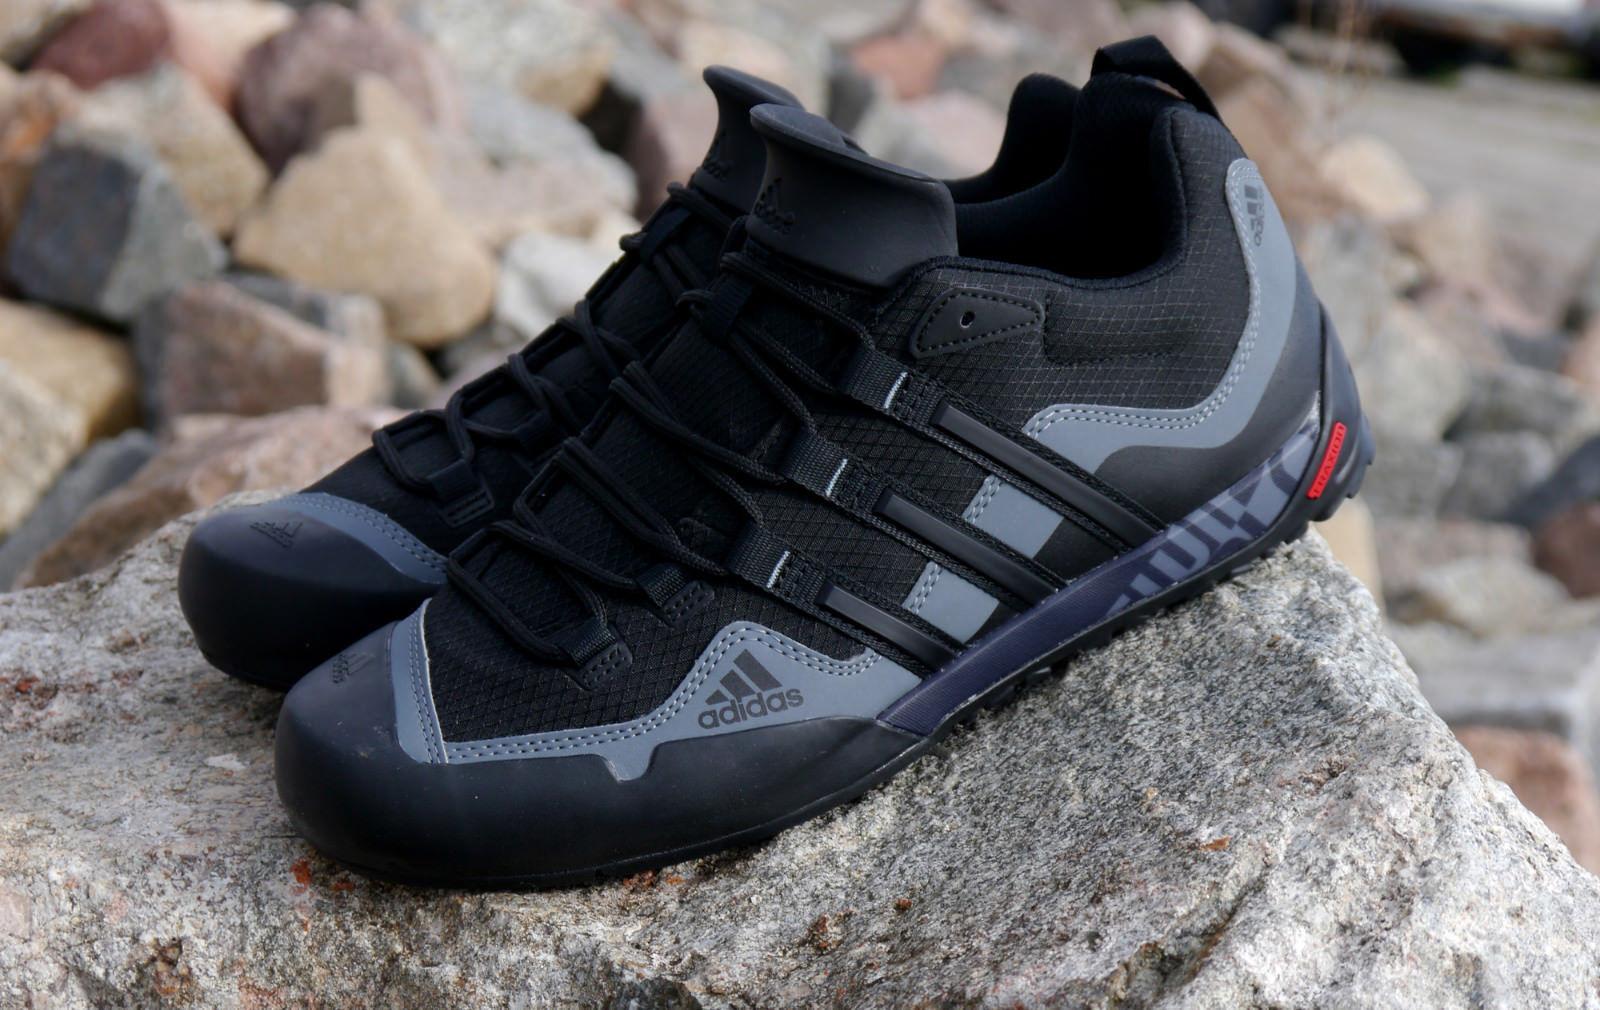 Señores Schue trekking zapatos outdoor adidas Terrex Swift solo